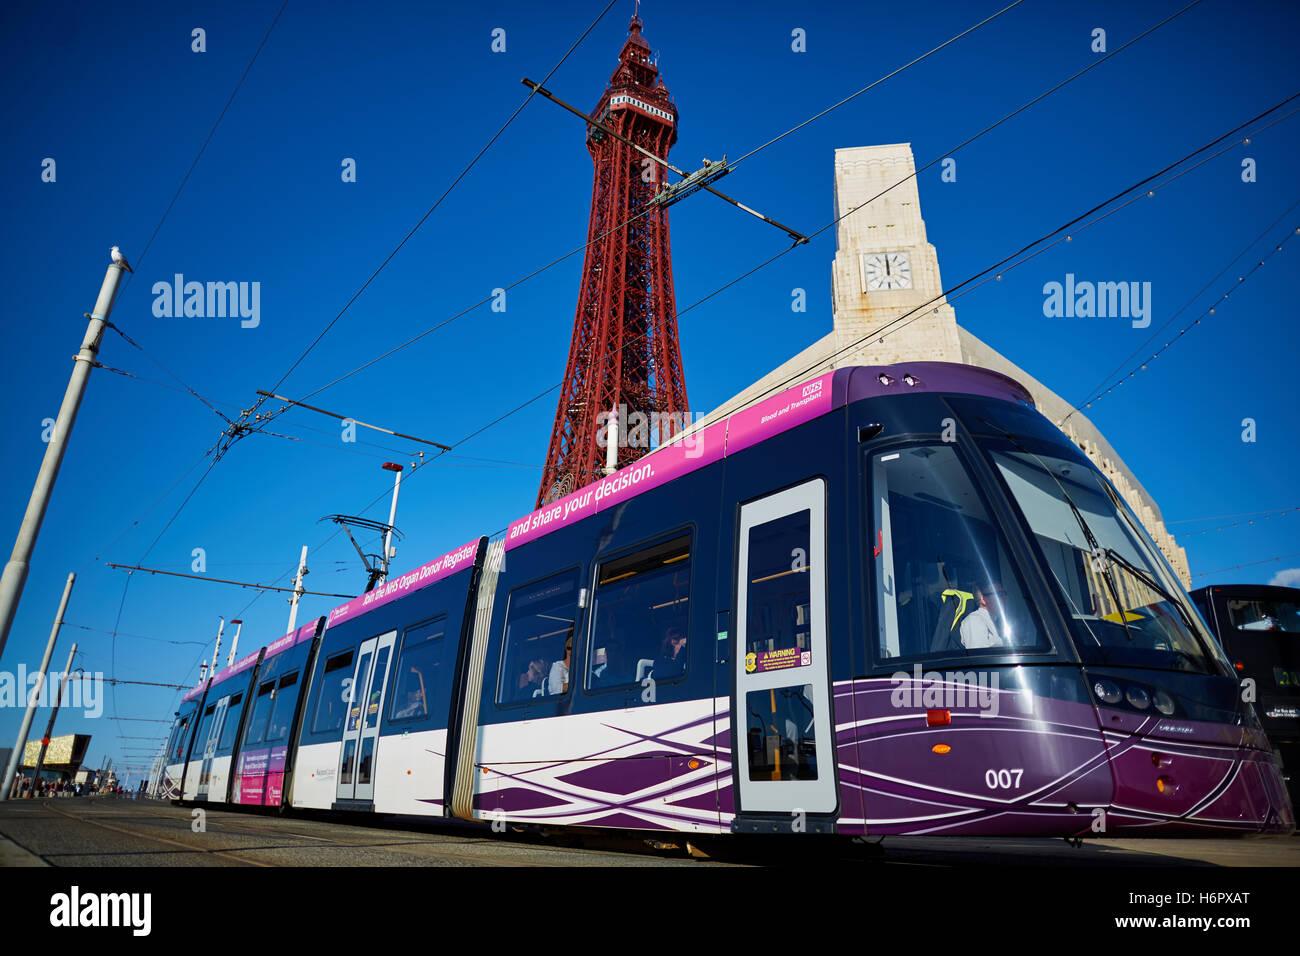 Blackpool ftower modern tram light rail  Holiday sea side town resort Lancashire tourist attractions  tower copyspace Stock Photo